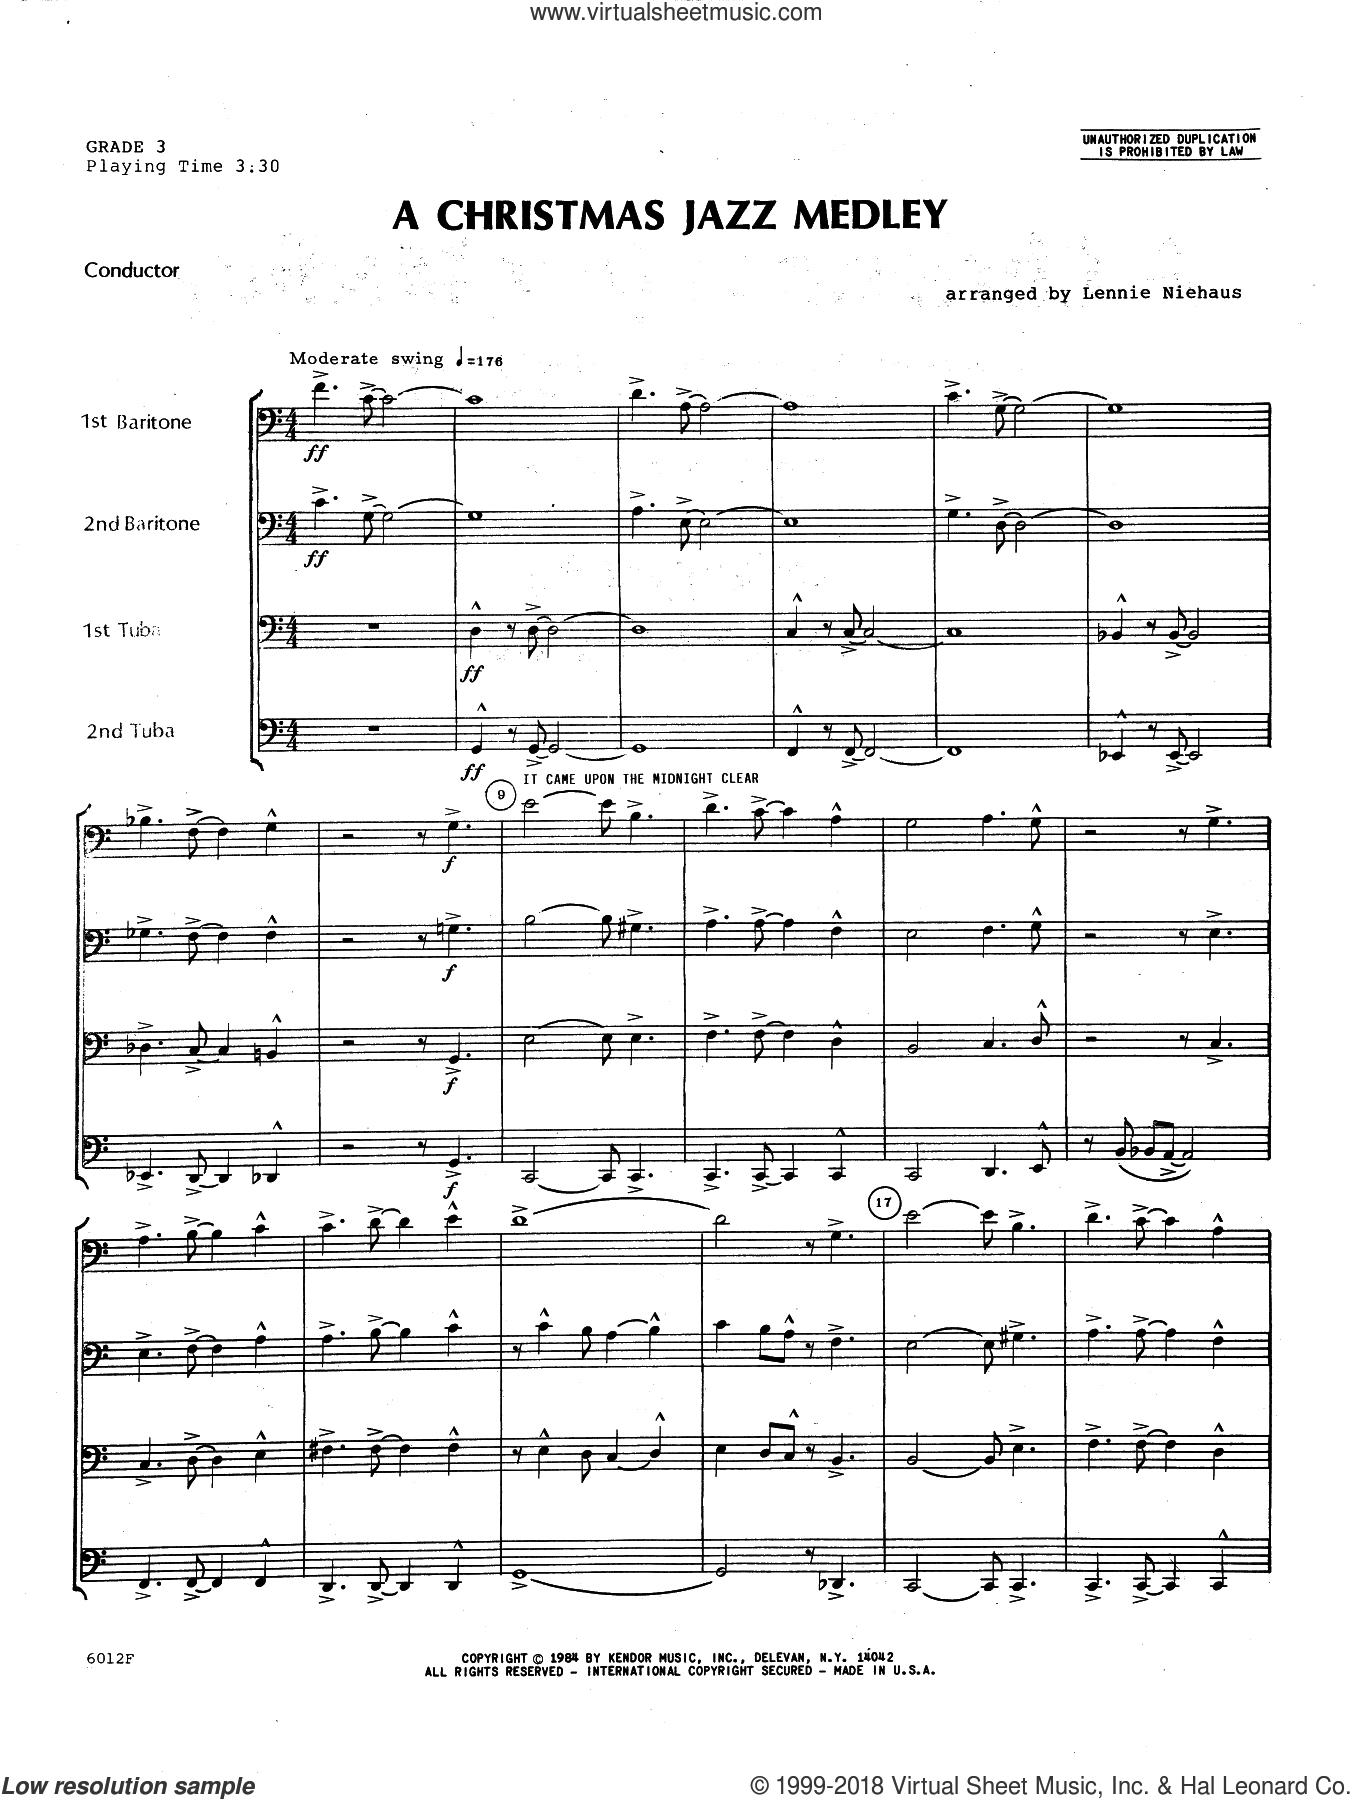 Christmas Jazz Medley (COMPLETE) sheet music for brass quartet by Lennie Niehaus, intermediate skill level